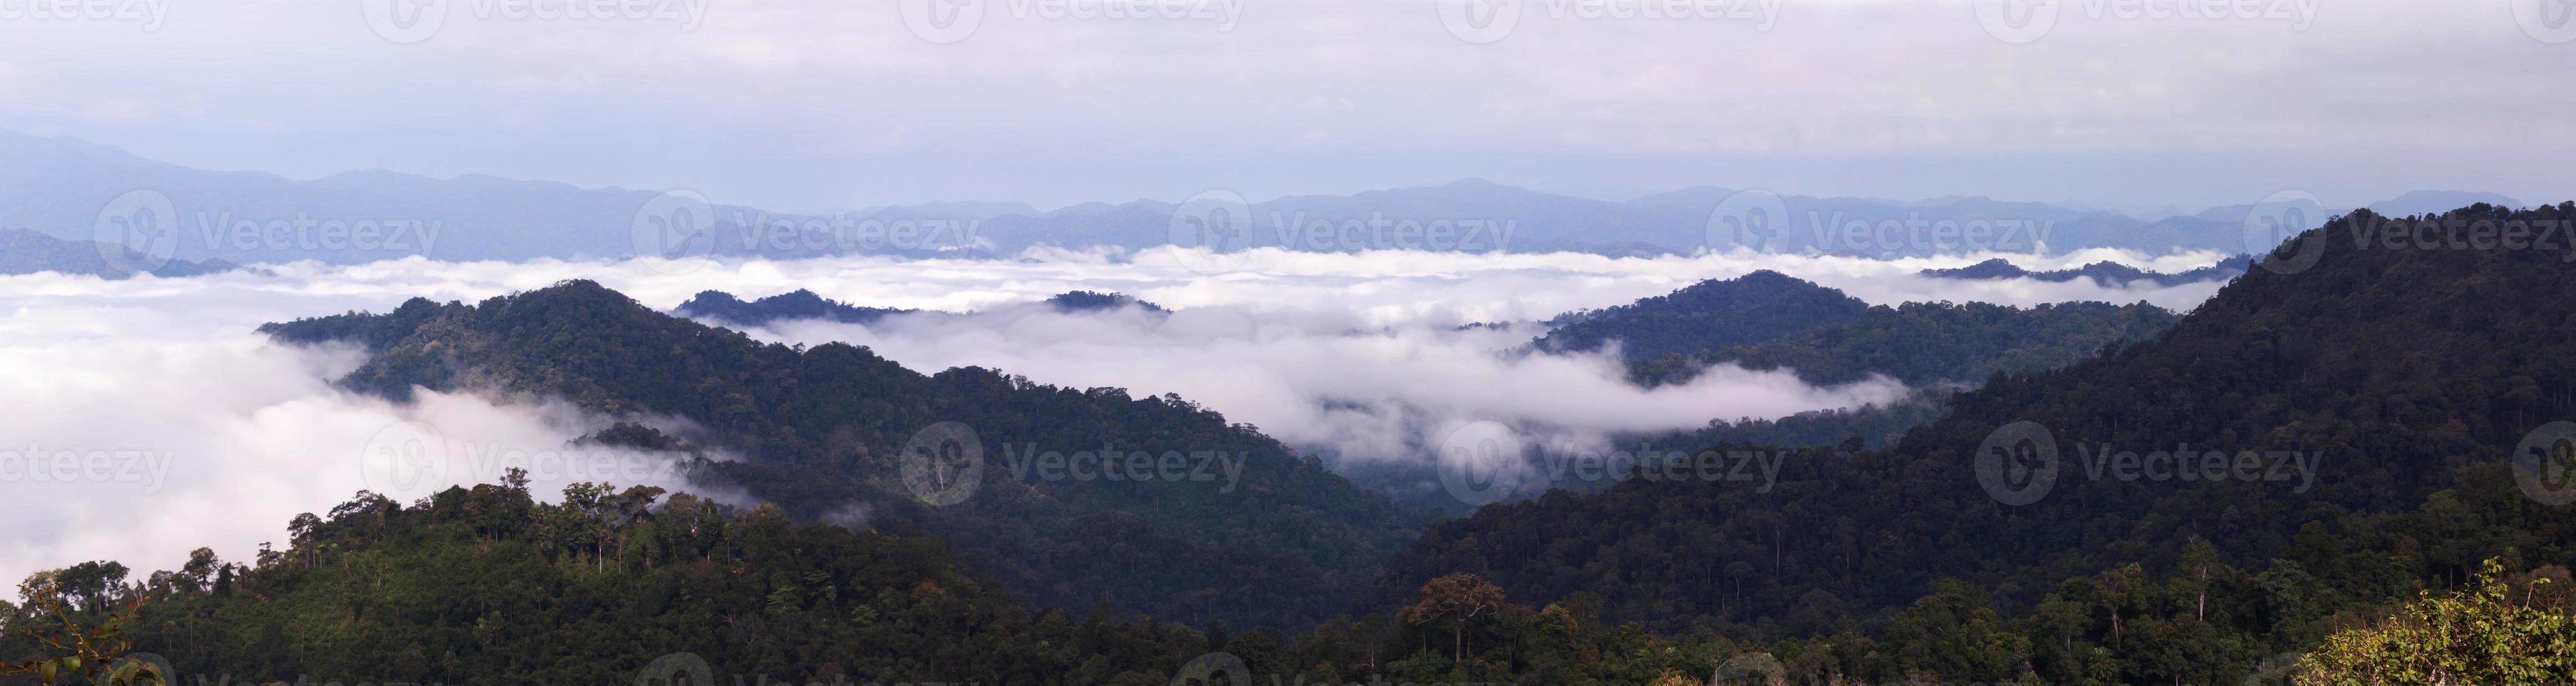 Gebirgszüge mit Nebel im Panorama foto